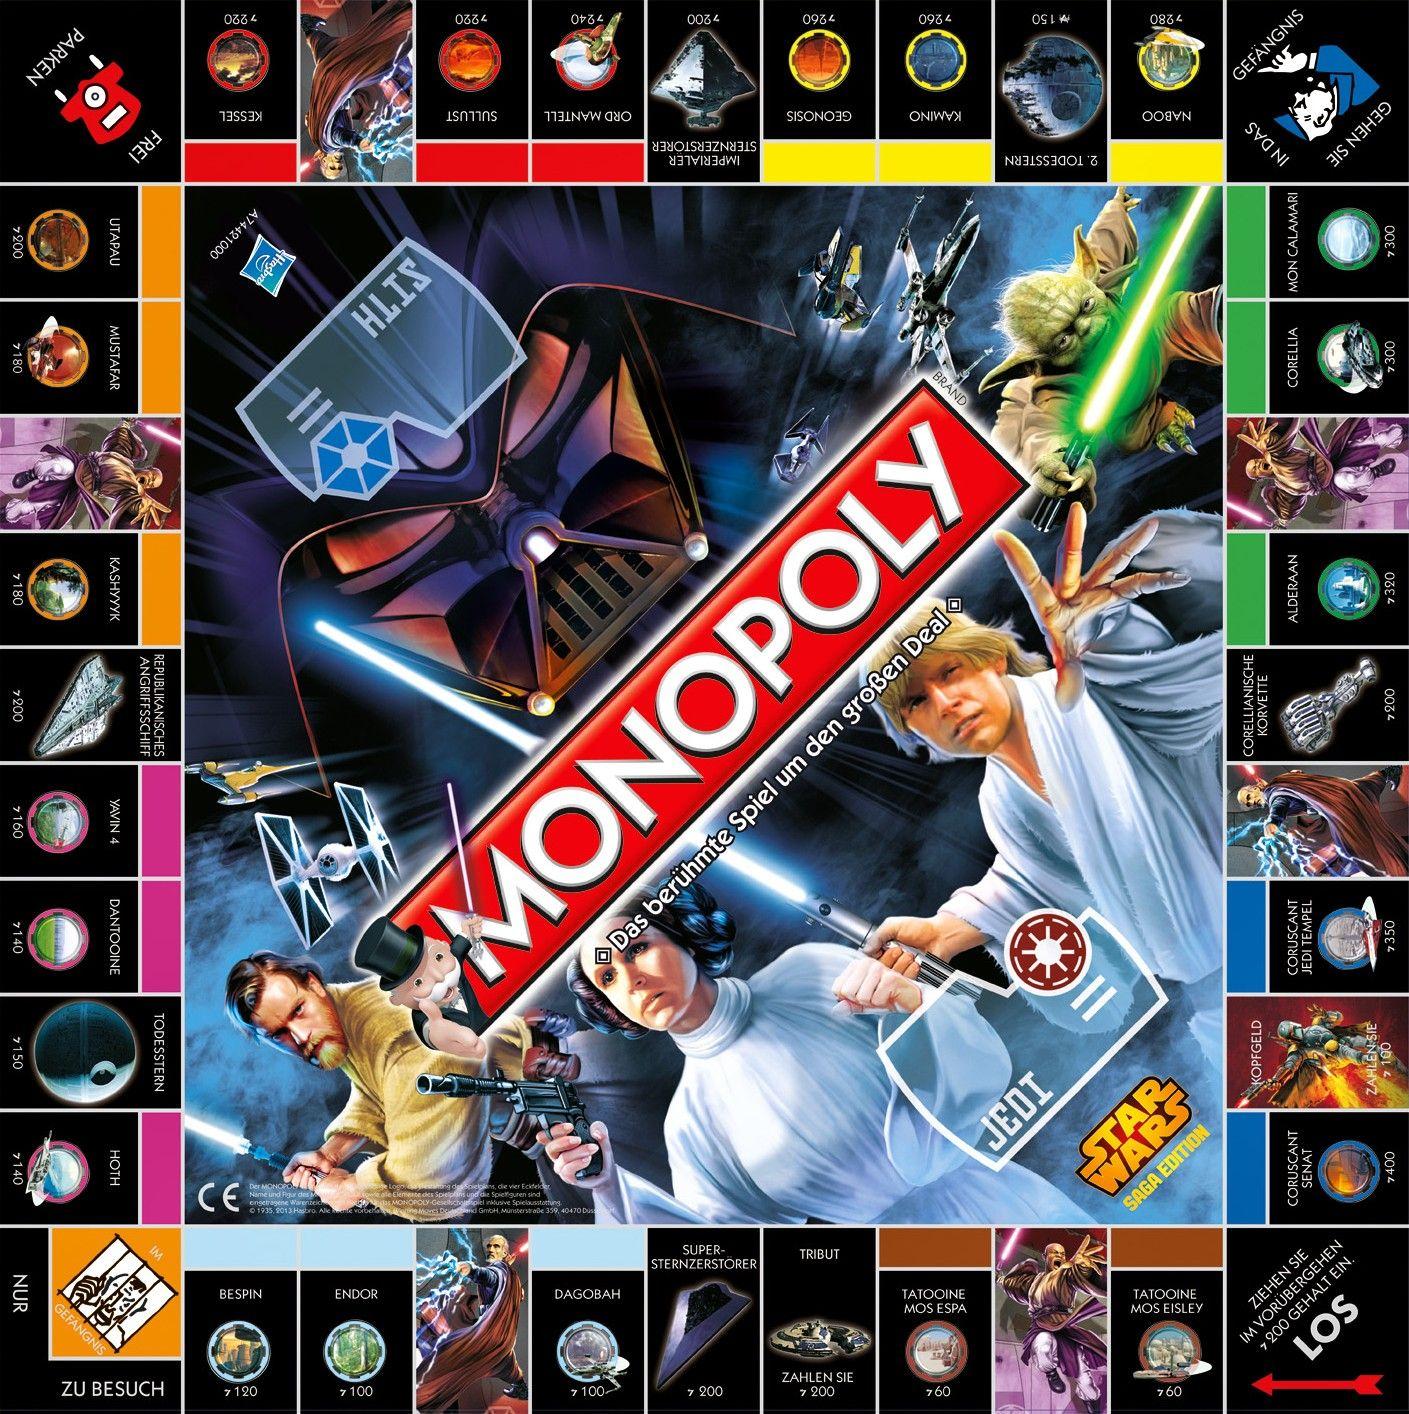 Plateau Star wars prints, Monopoly, Uno cards